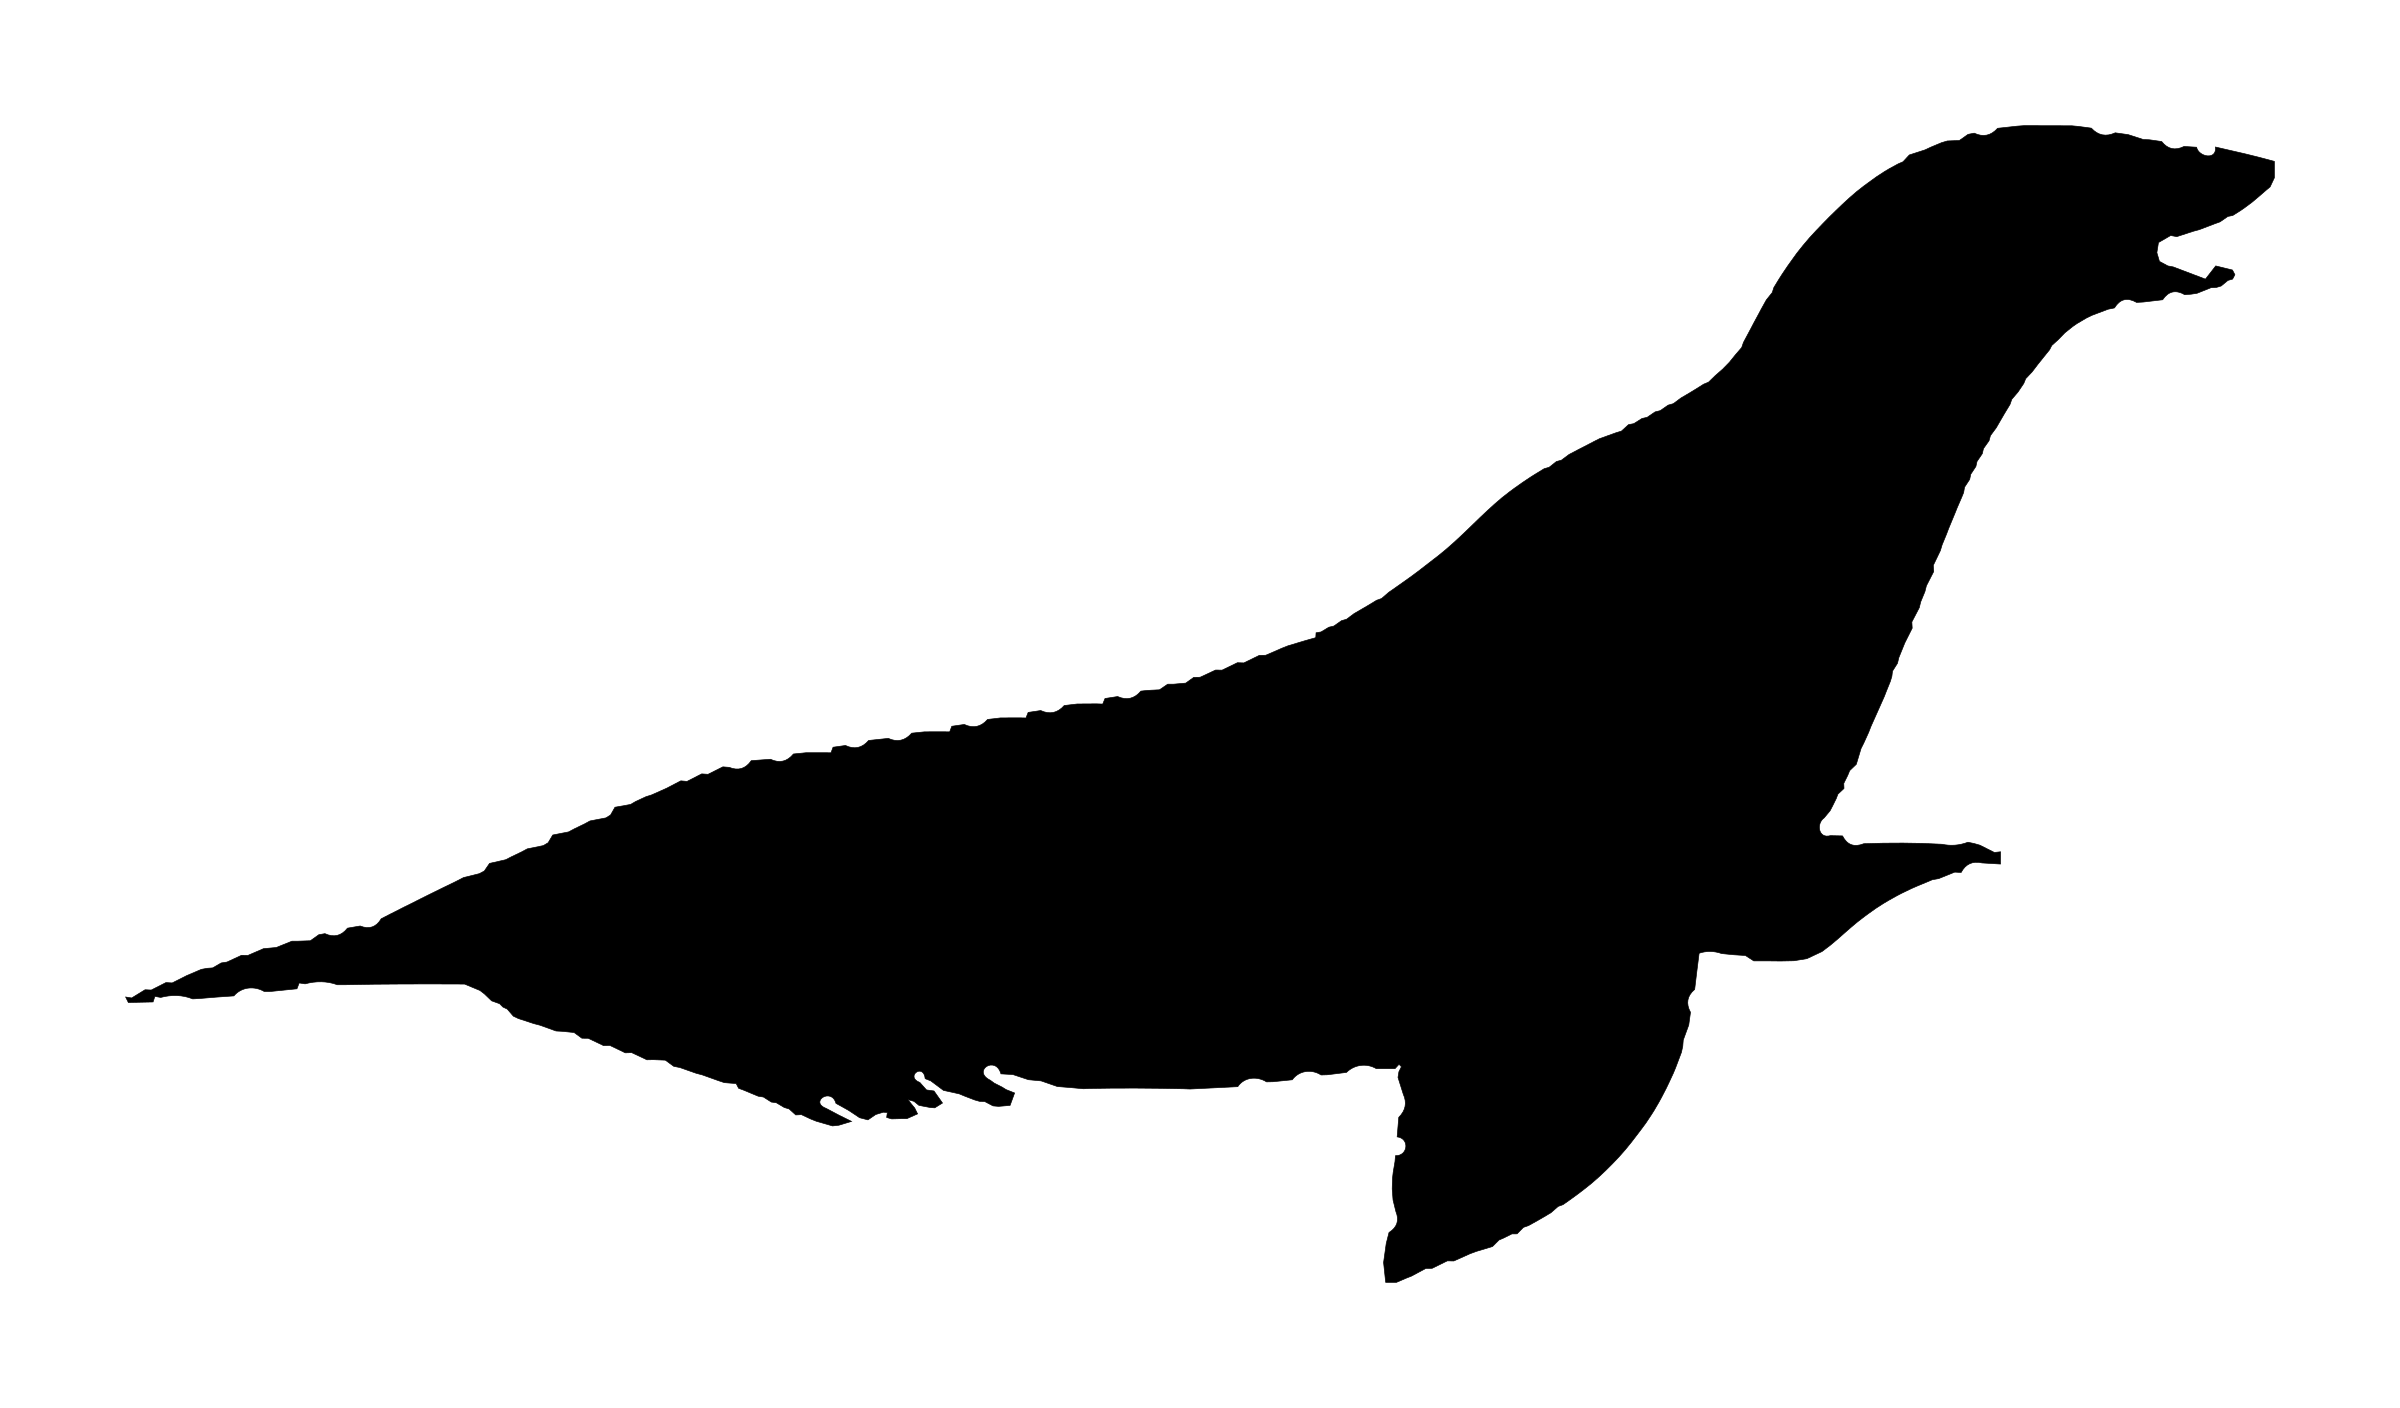 2400x1408 Silhouette